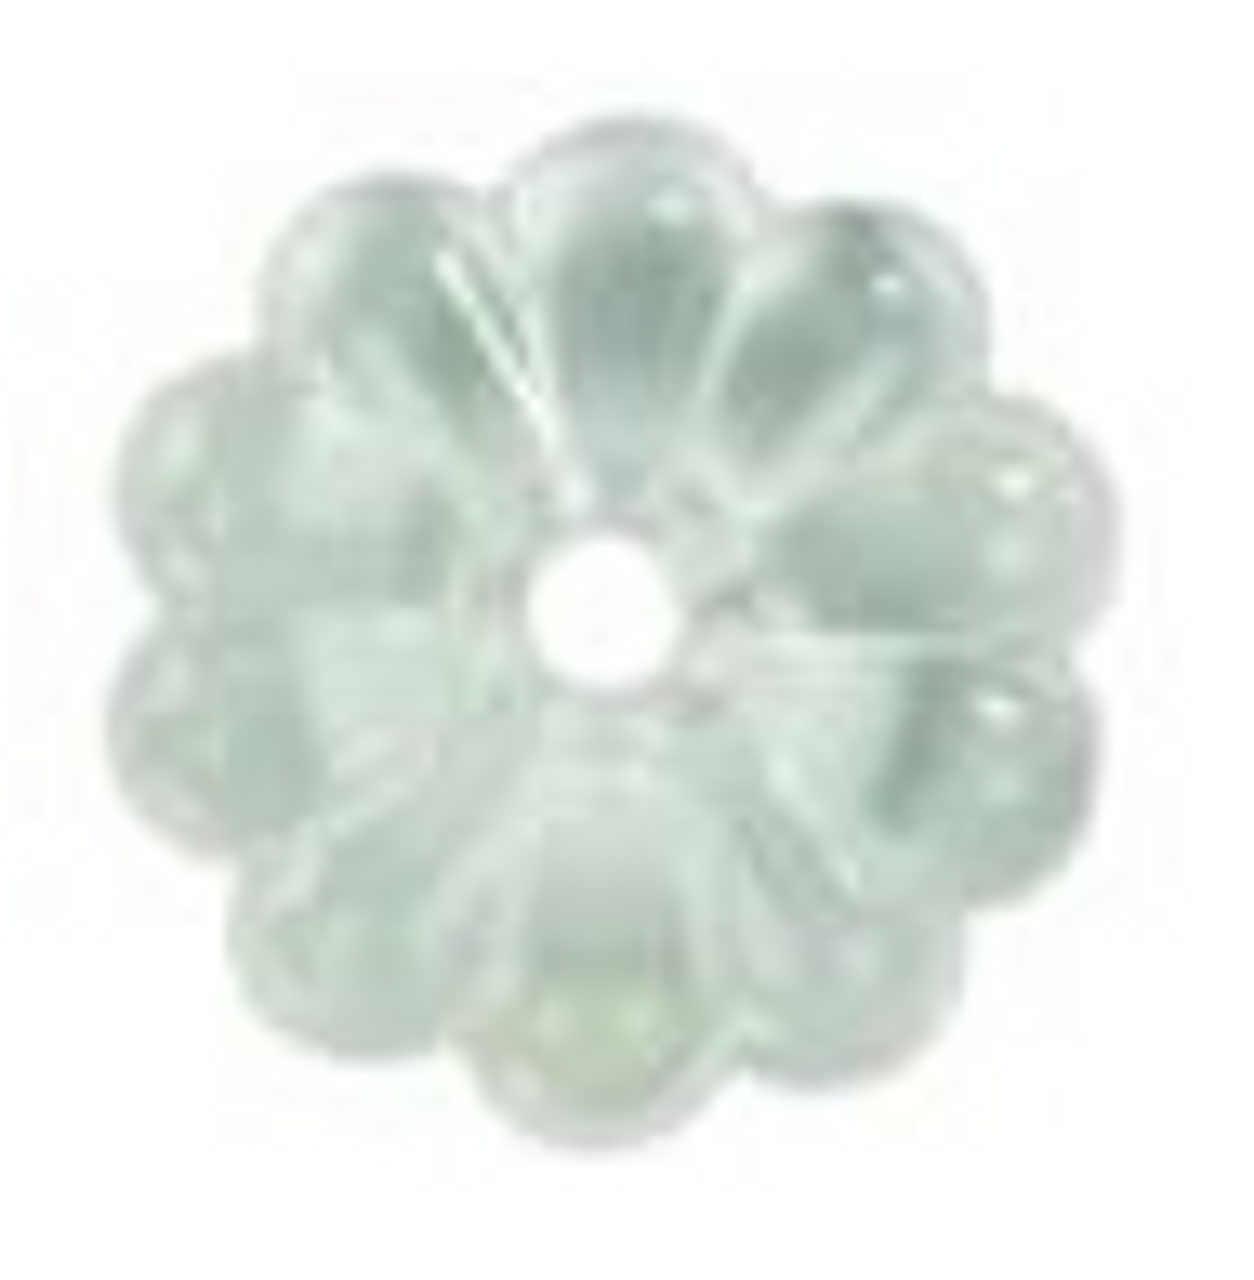 PLASTIC ROSETTES - CLEAR (20-1109)